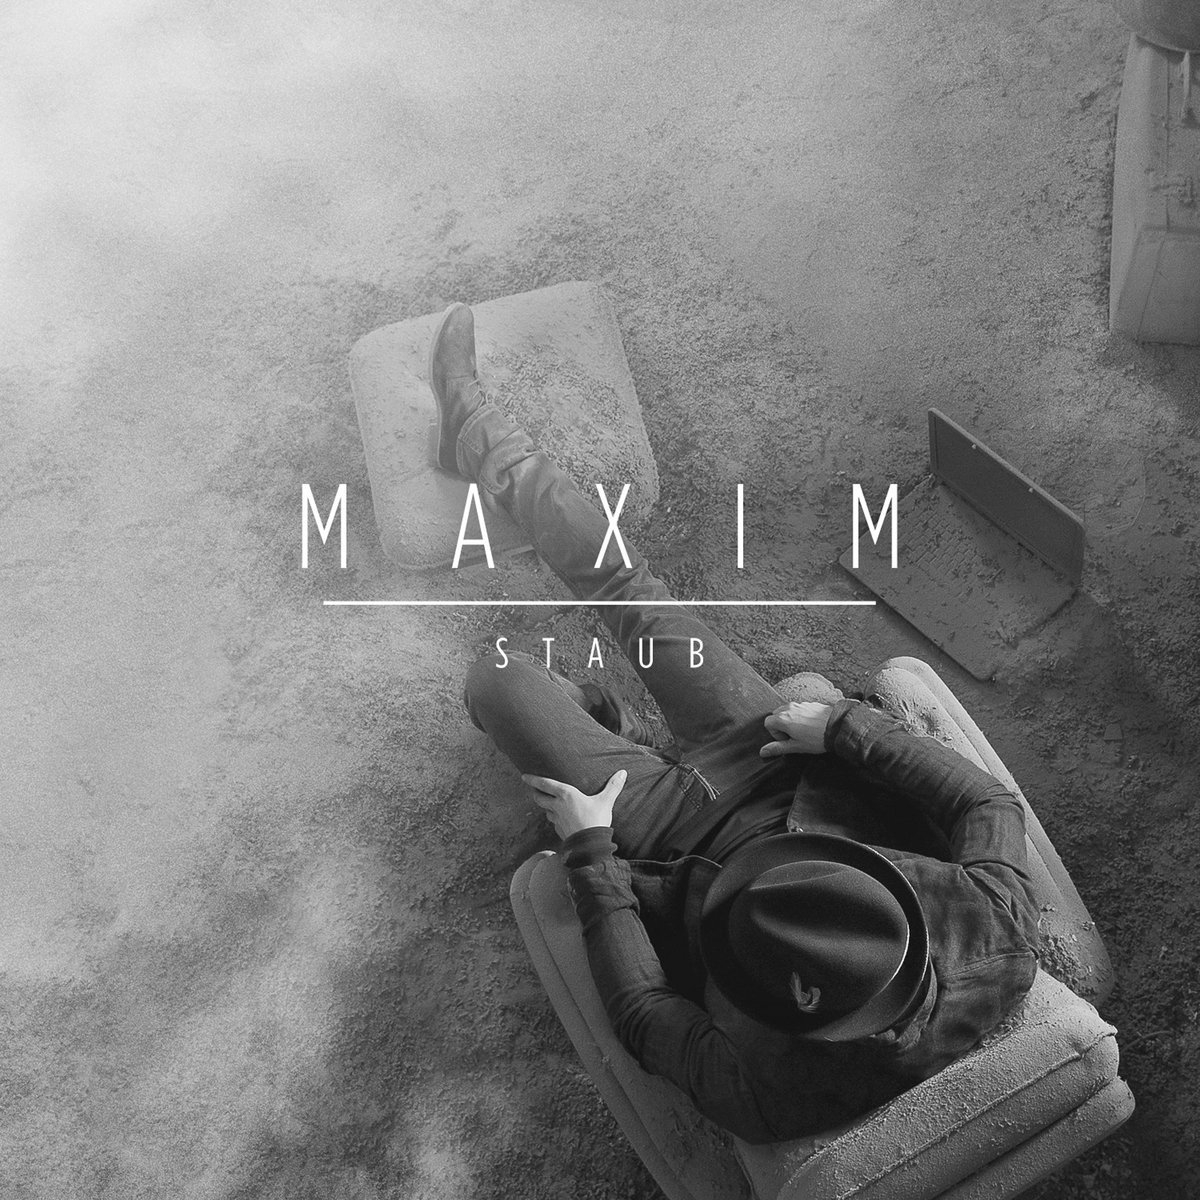 maxim - staub bw